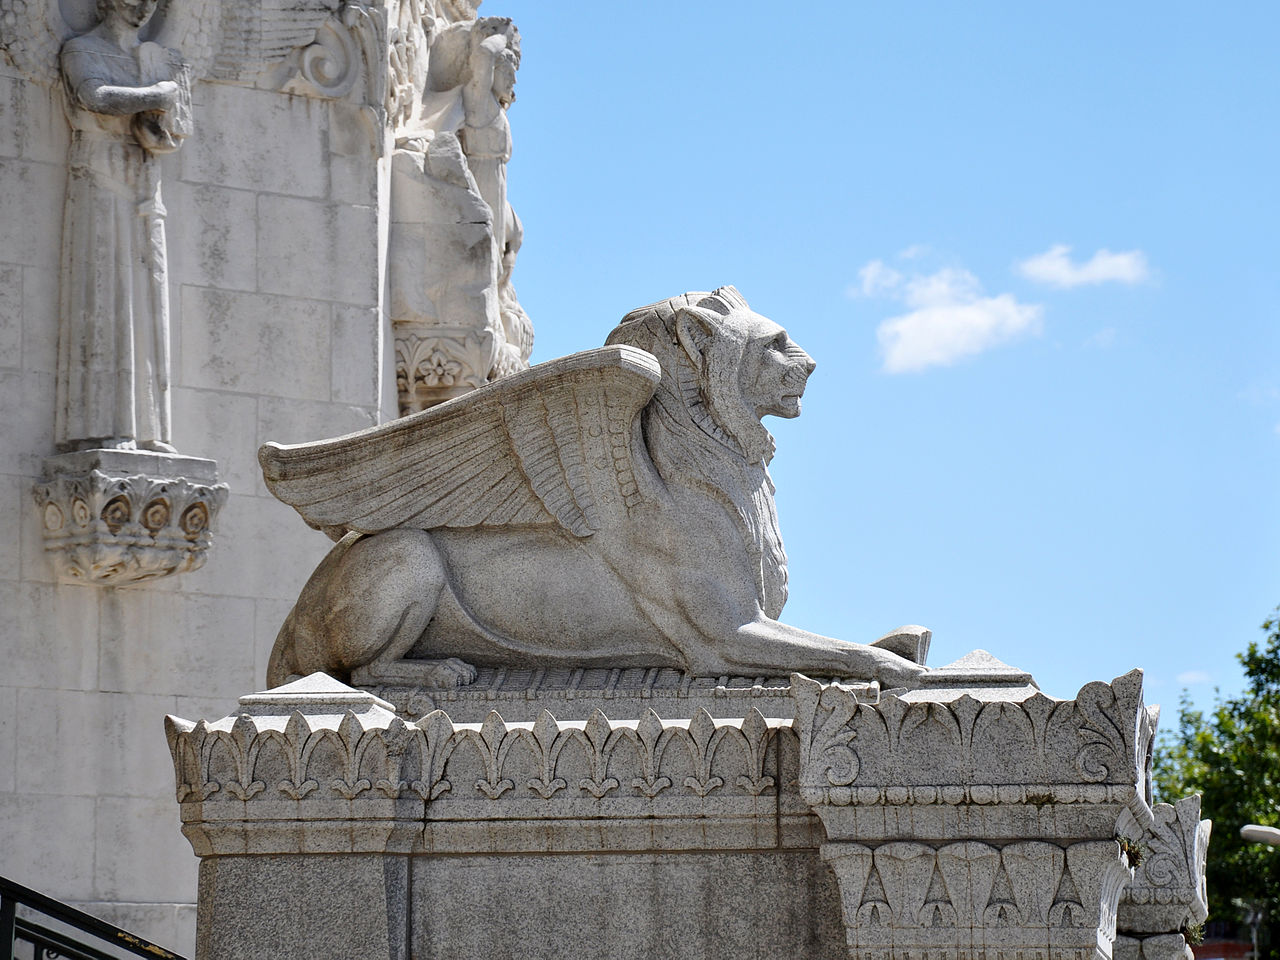 Базилика Нотр-Дам-де-Фурвьер, крылатый лев перед воротами